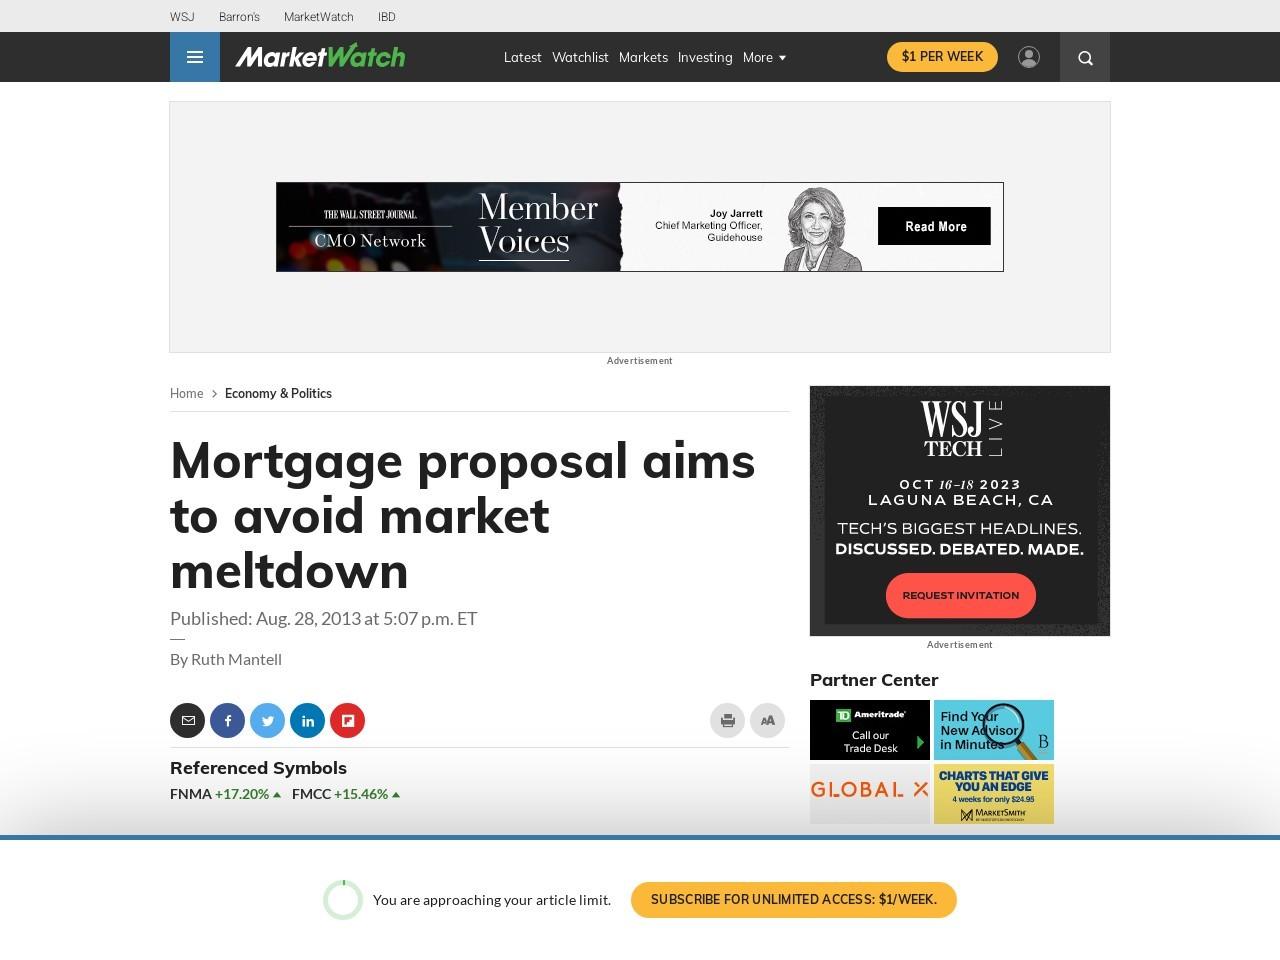 Mortgage proposal aims to avoid market meltdown